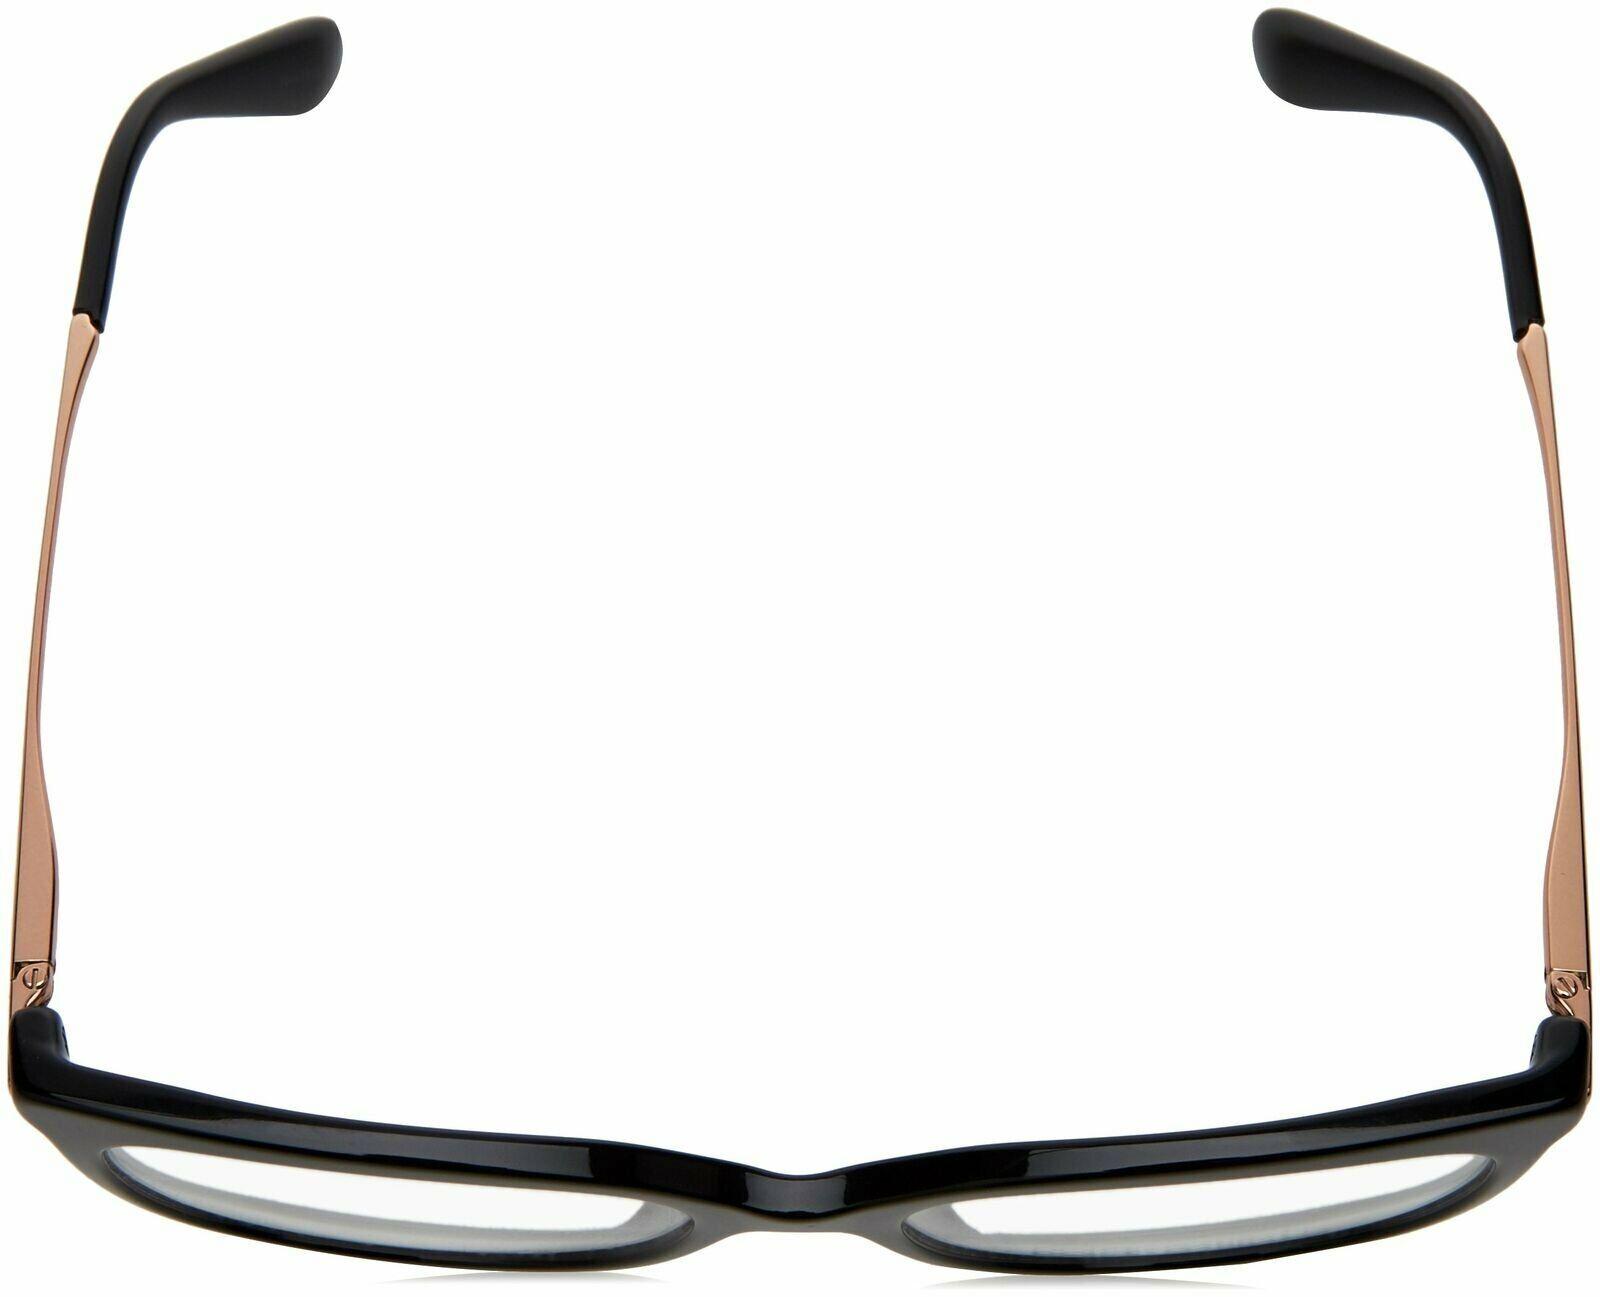 Dolce & Gabbana 0DG3259 Optical Square Womens Sunglasses Black 51